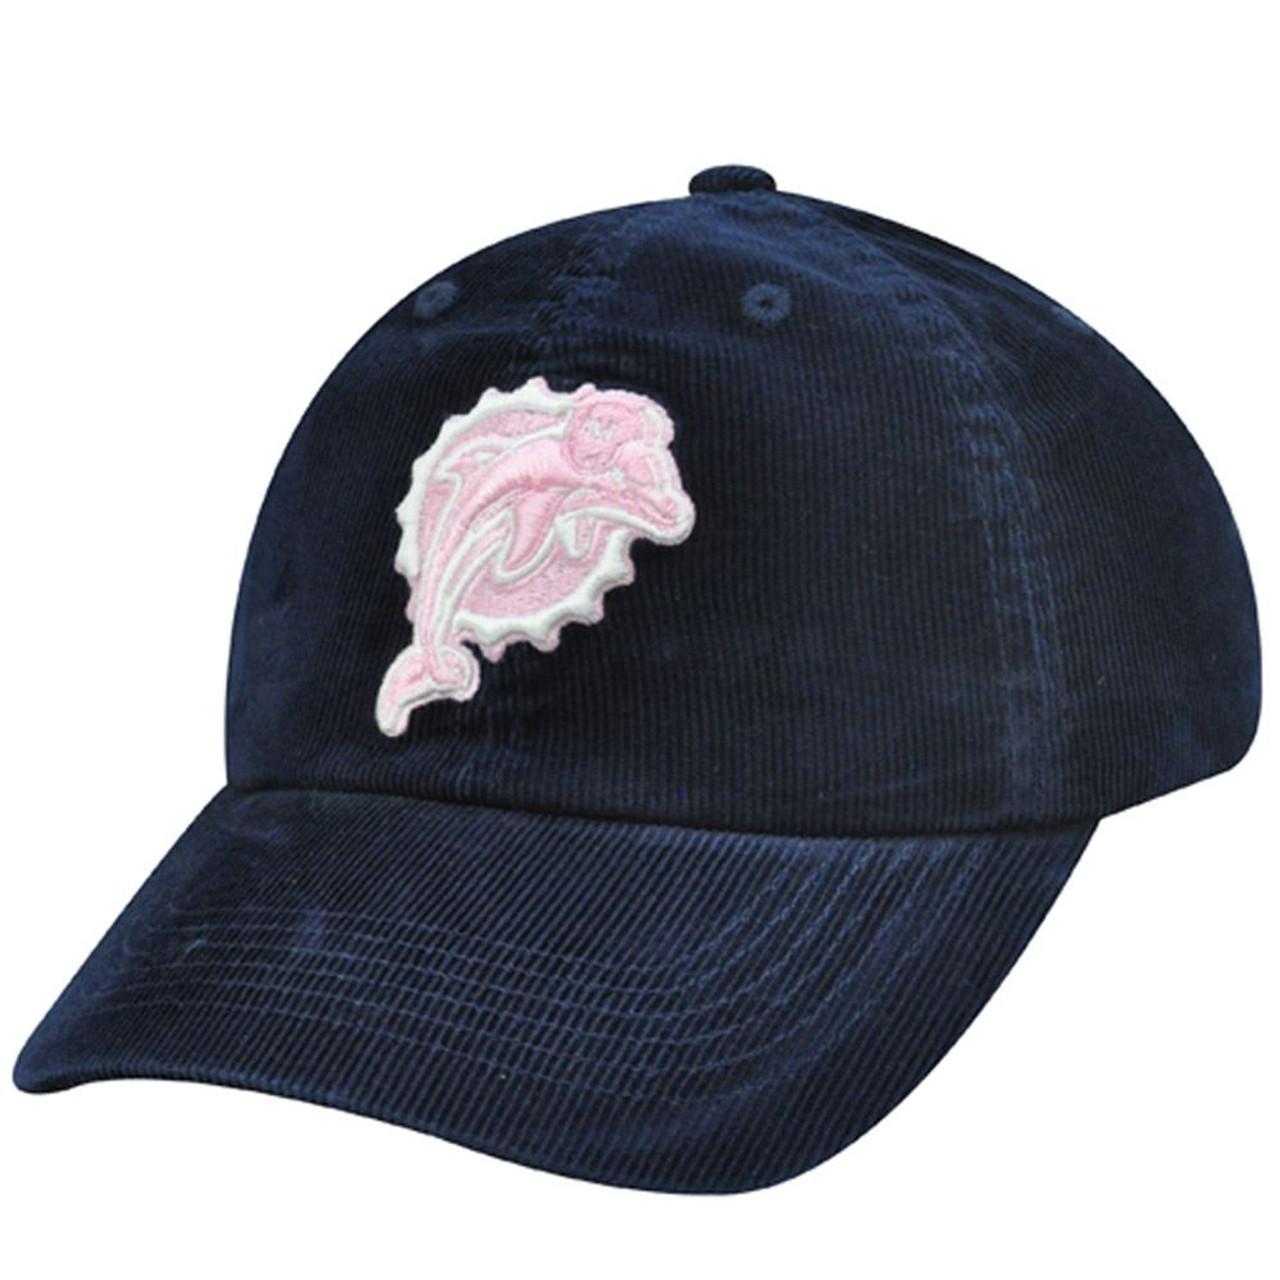 NFL Miami Dolphins Navy Blue Pink Corduroy Cotton Hat Cap Womens Ladies  Girls - Sinbad Sports Store 34ee3a7f8d